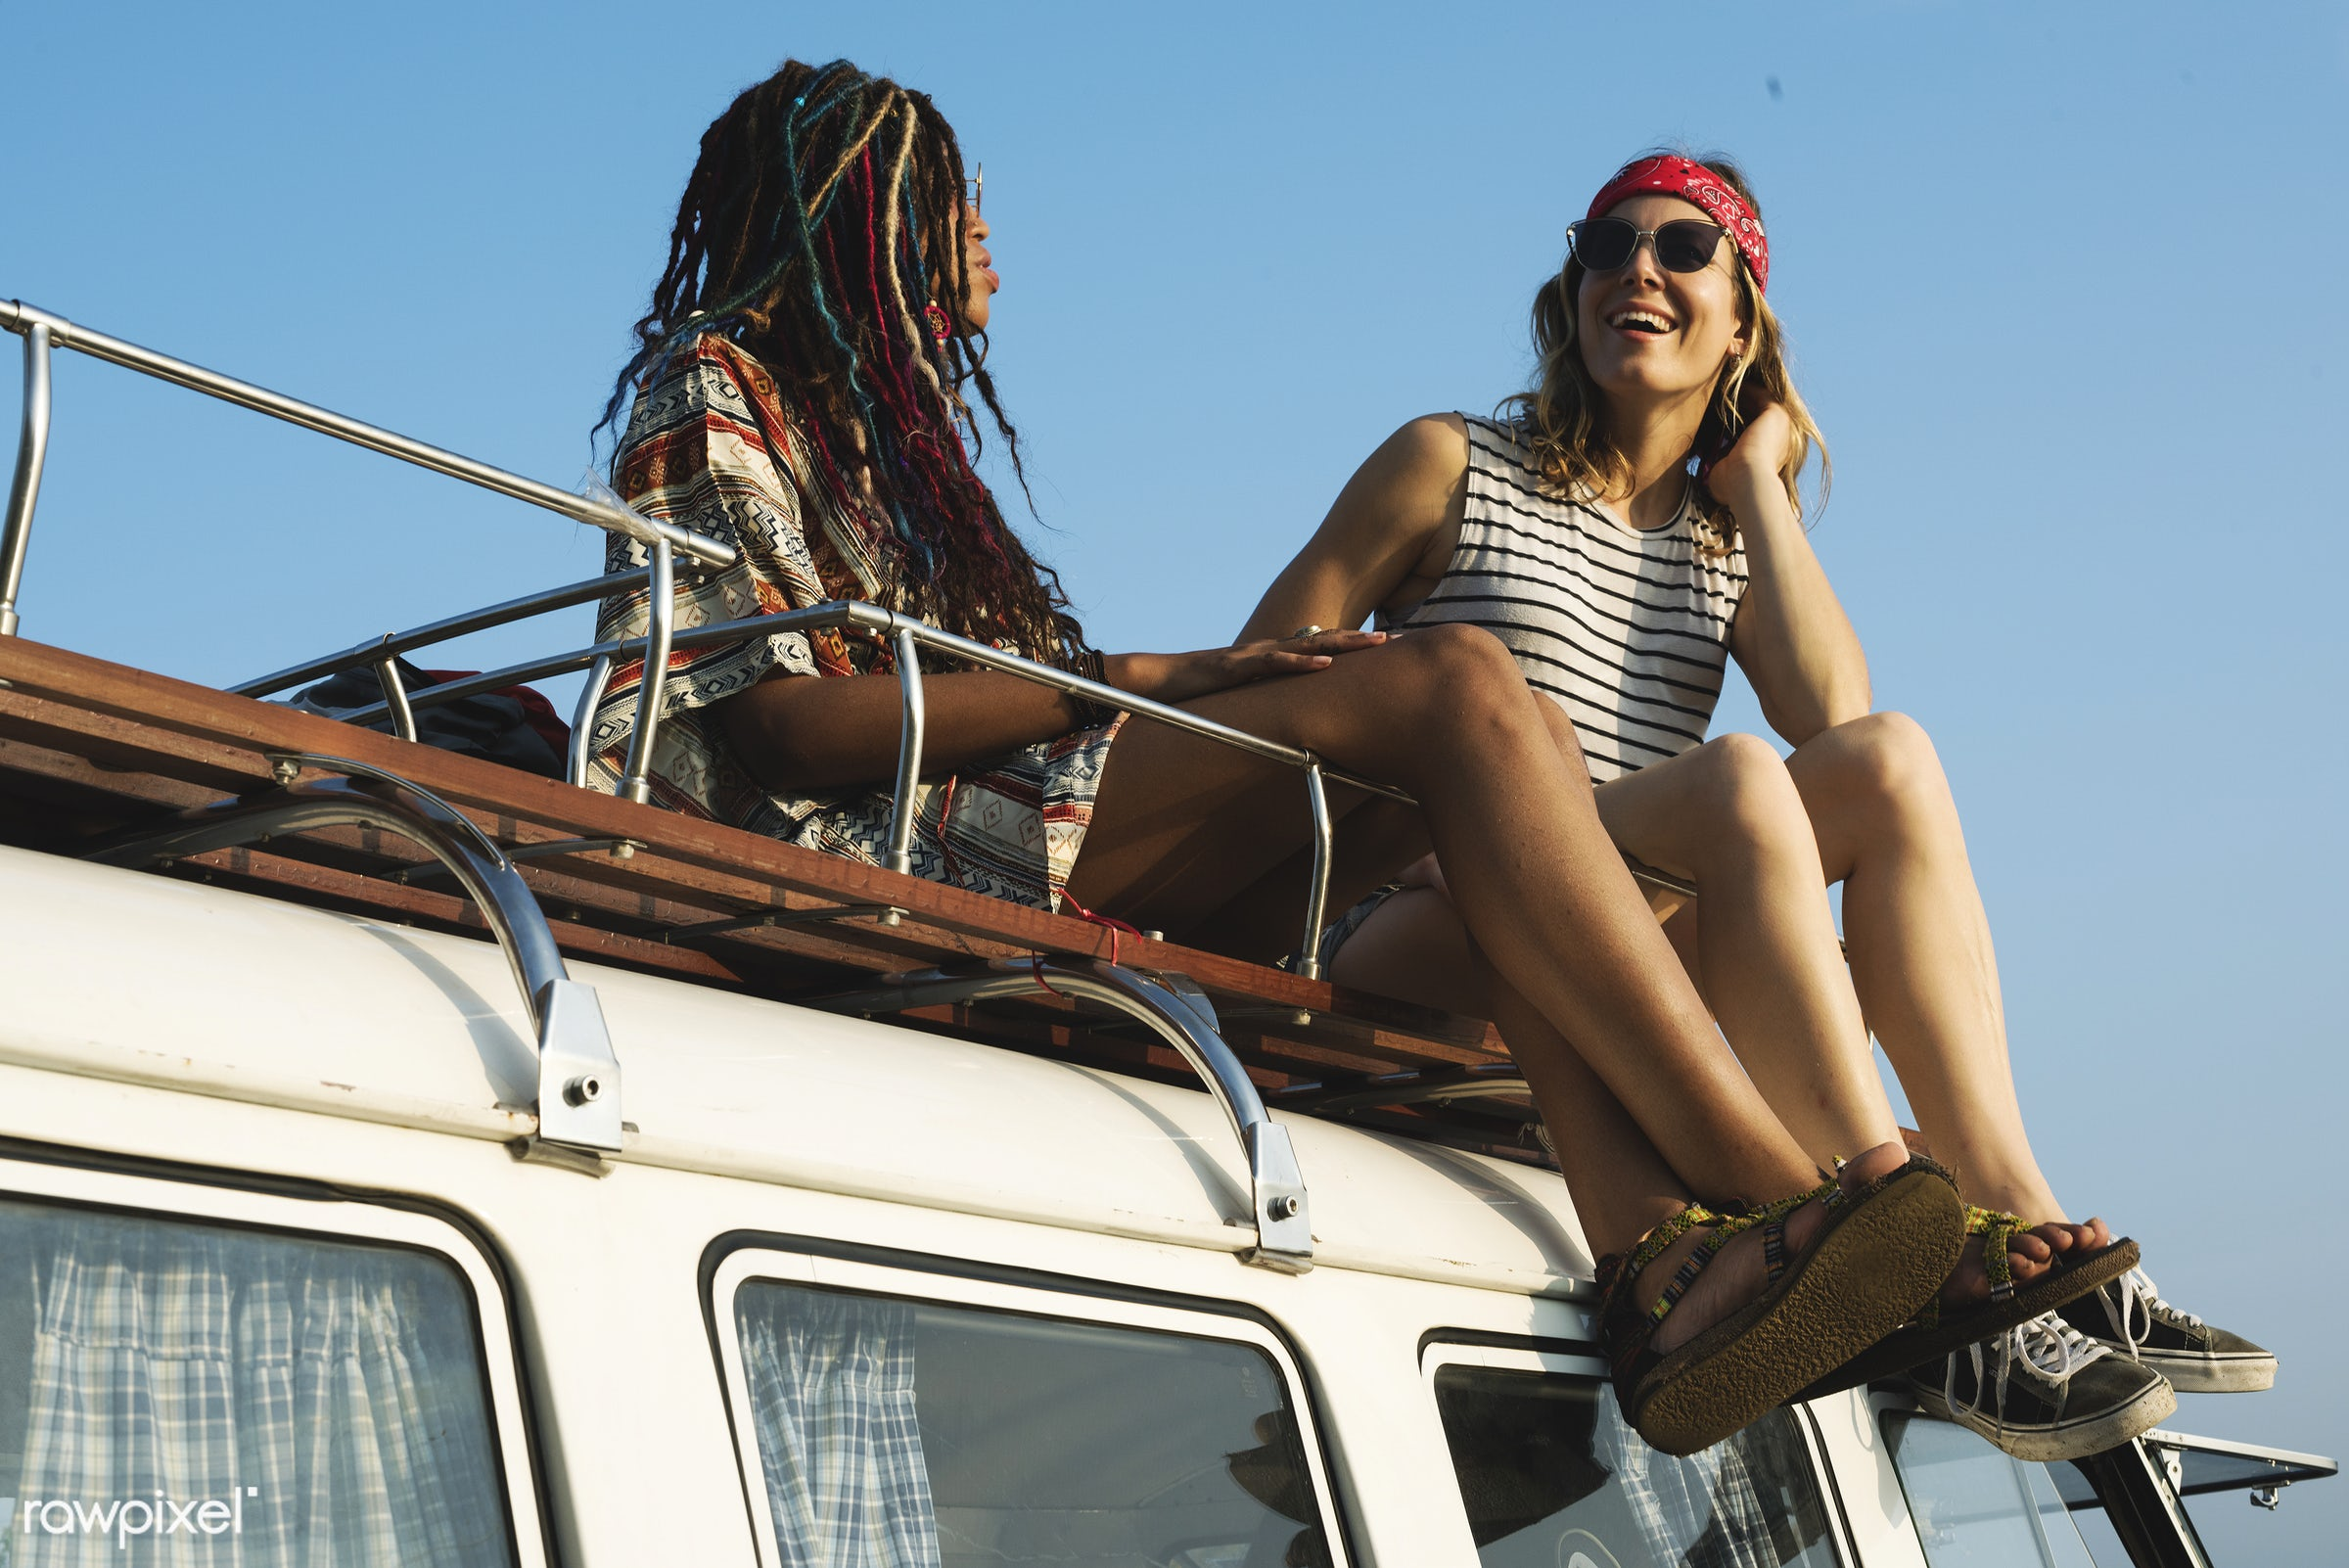 adult, adventure, diversity, enjoy, enjoyment, female, friends, friendship, fun, group, happiness, happy, hippy, hipster,...